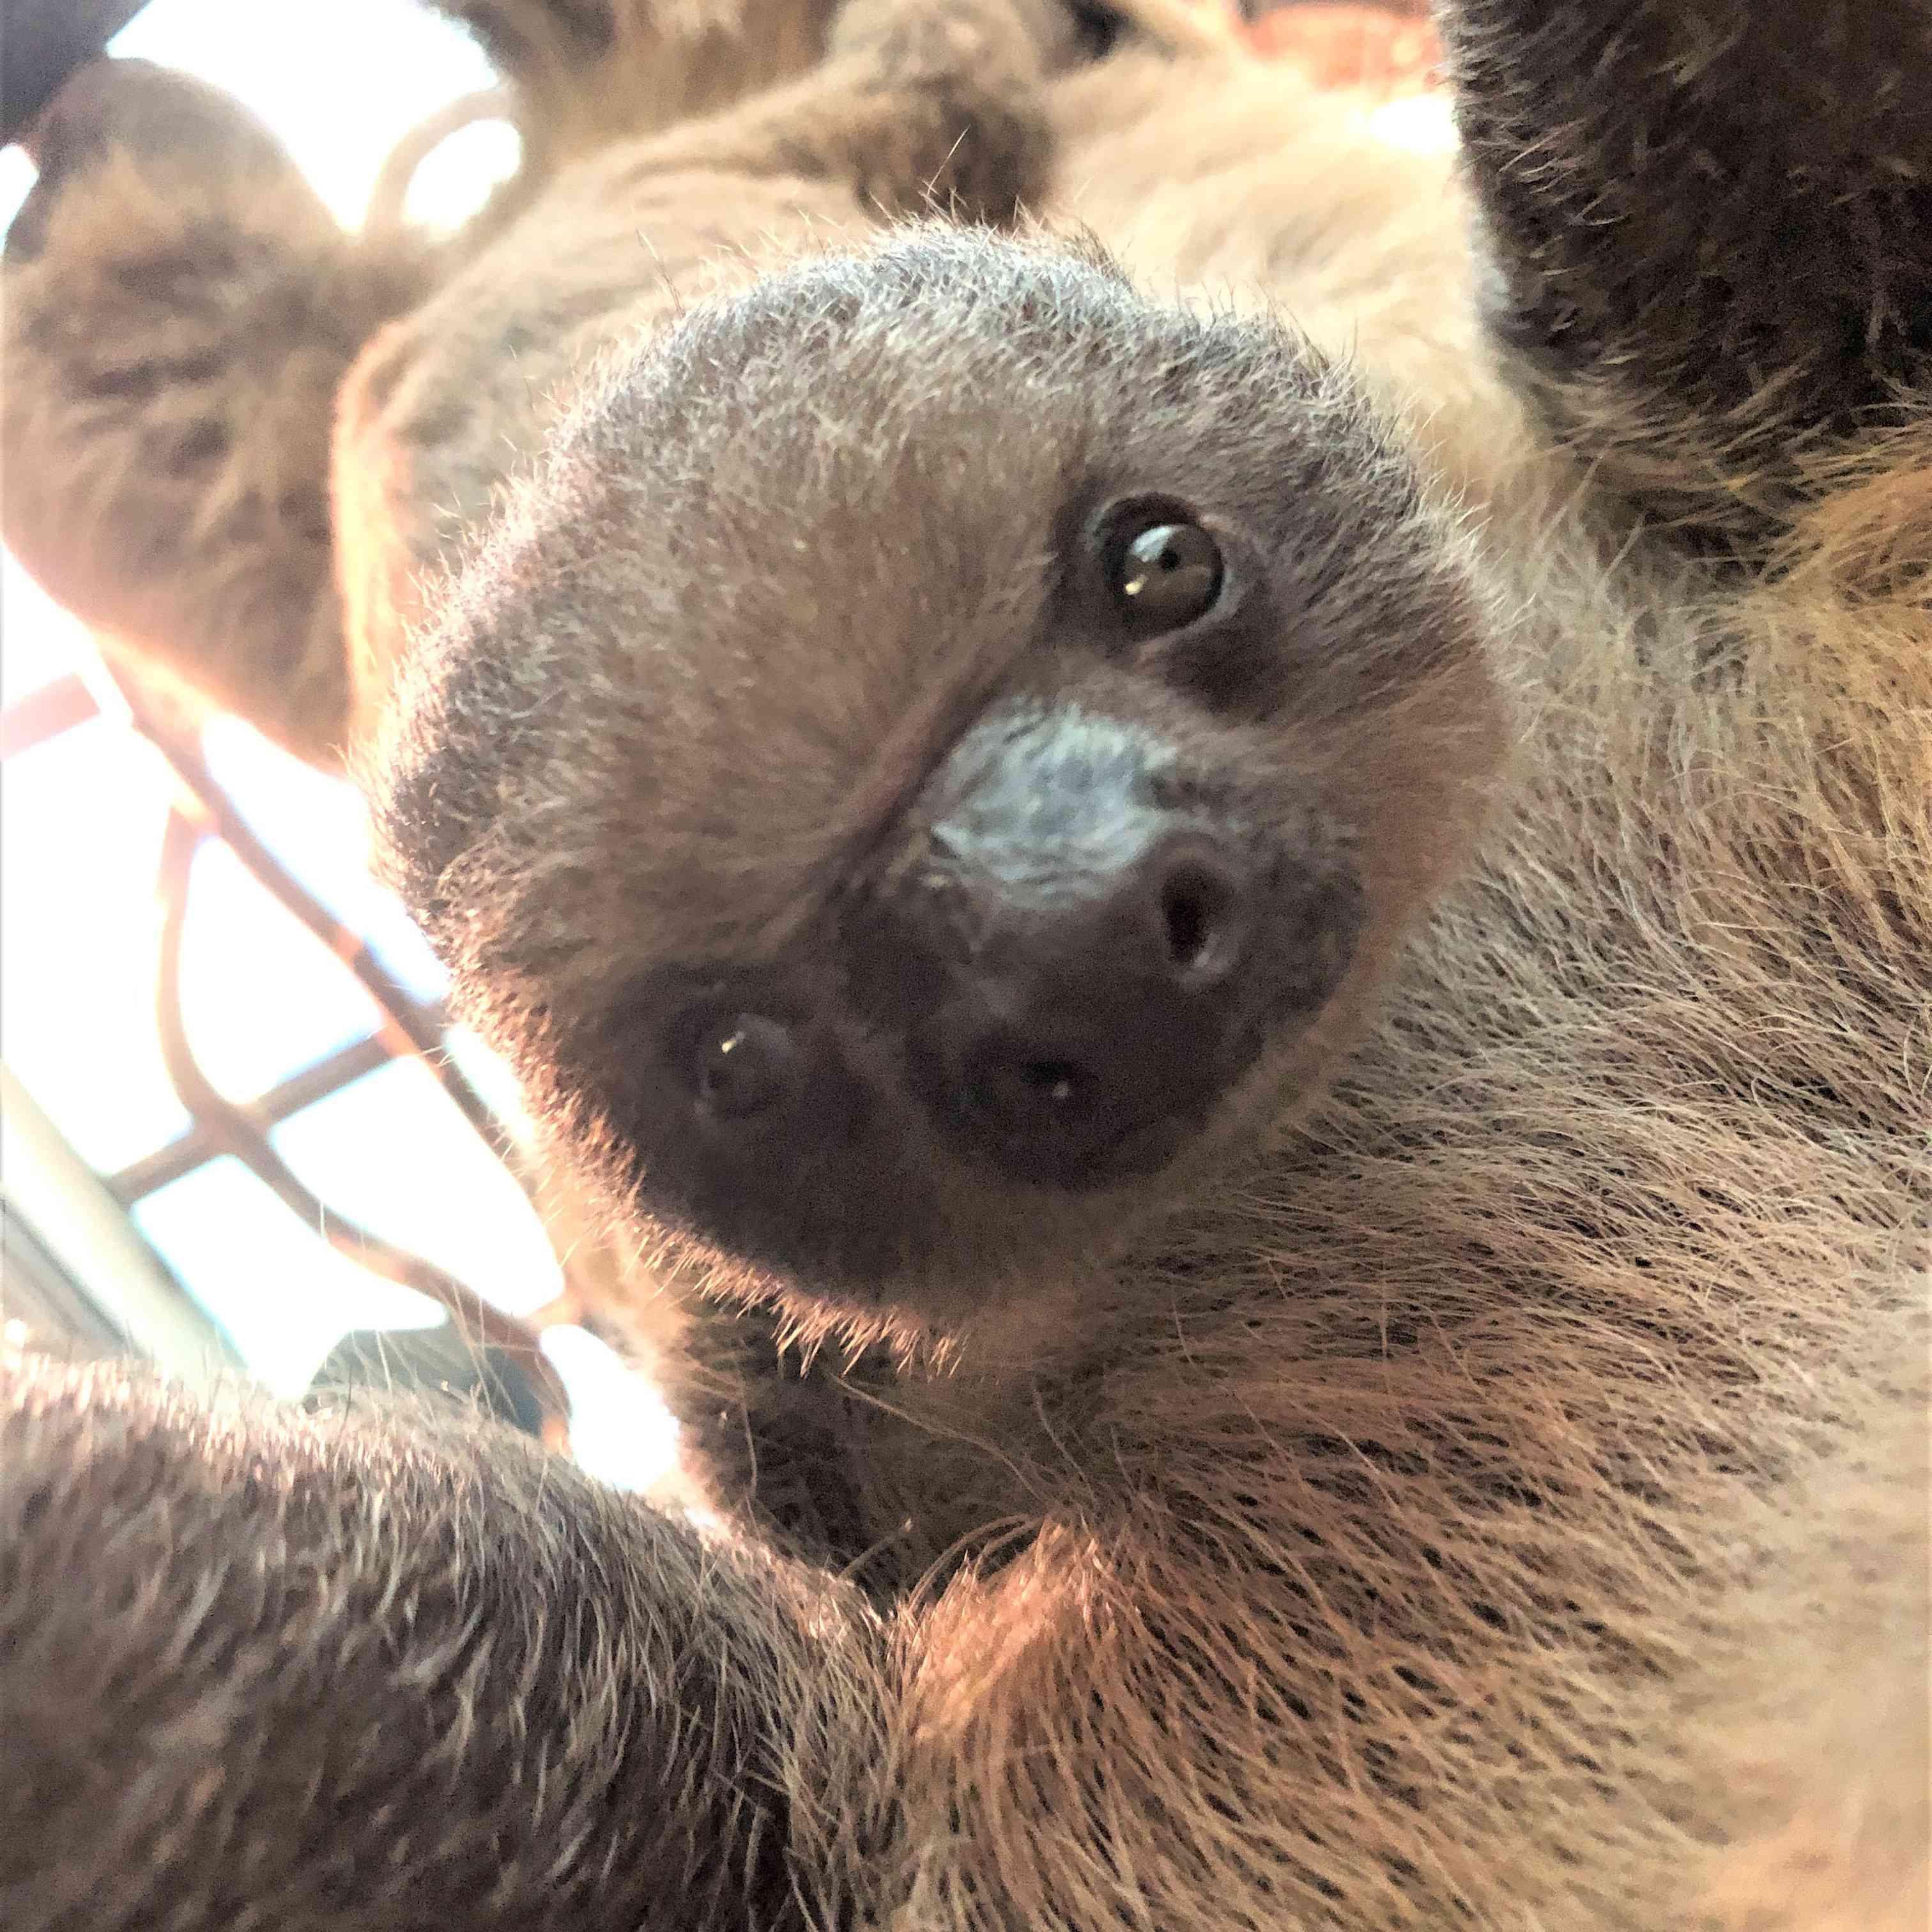 Truffle the baby sloth